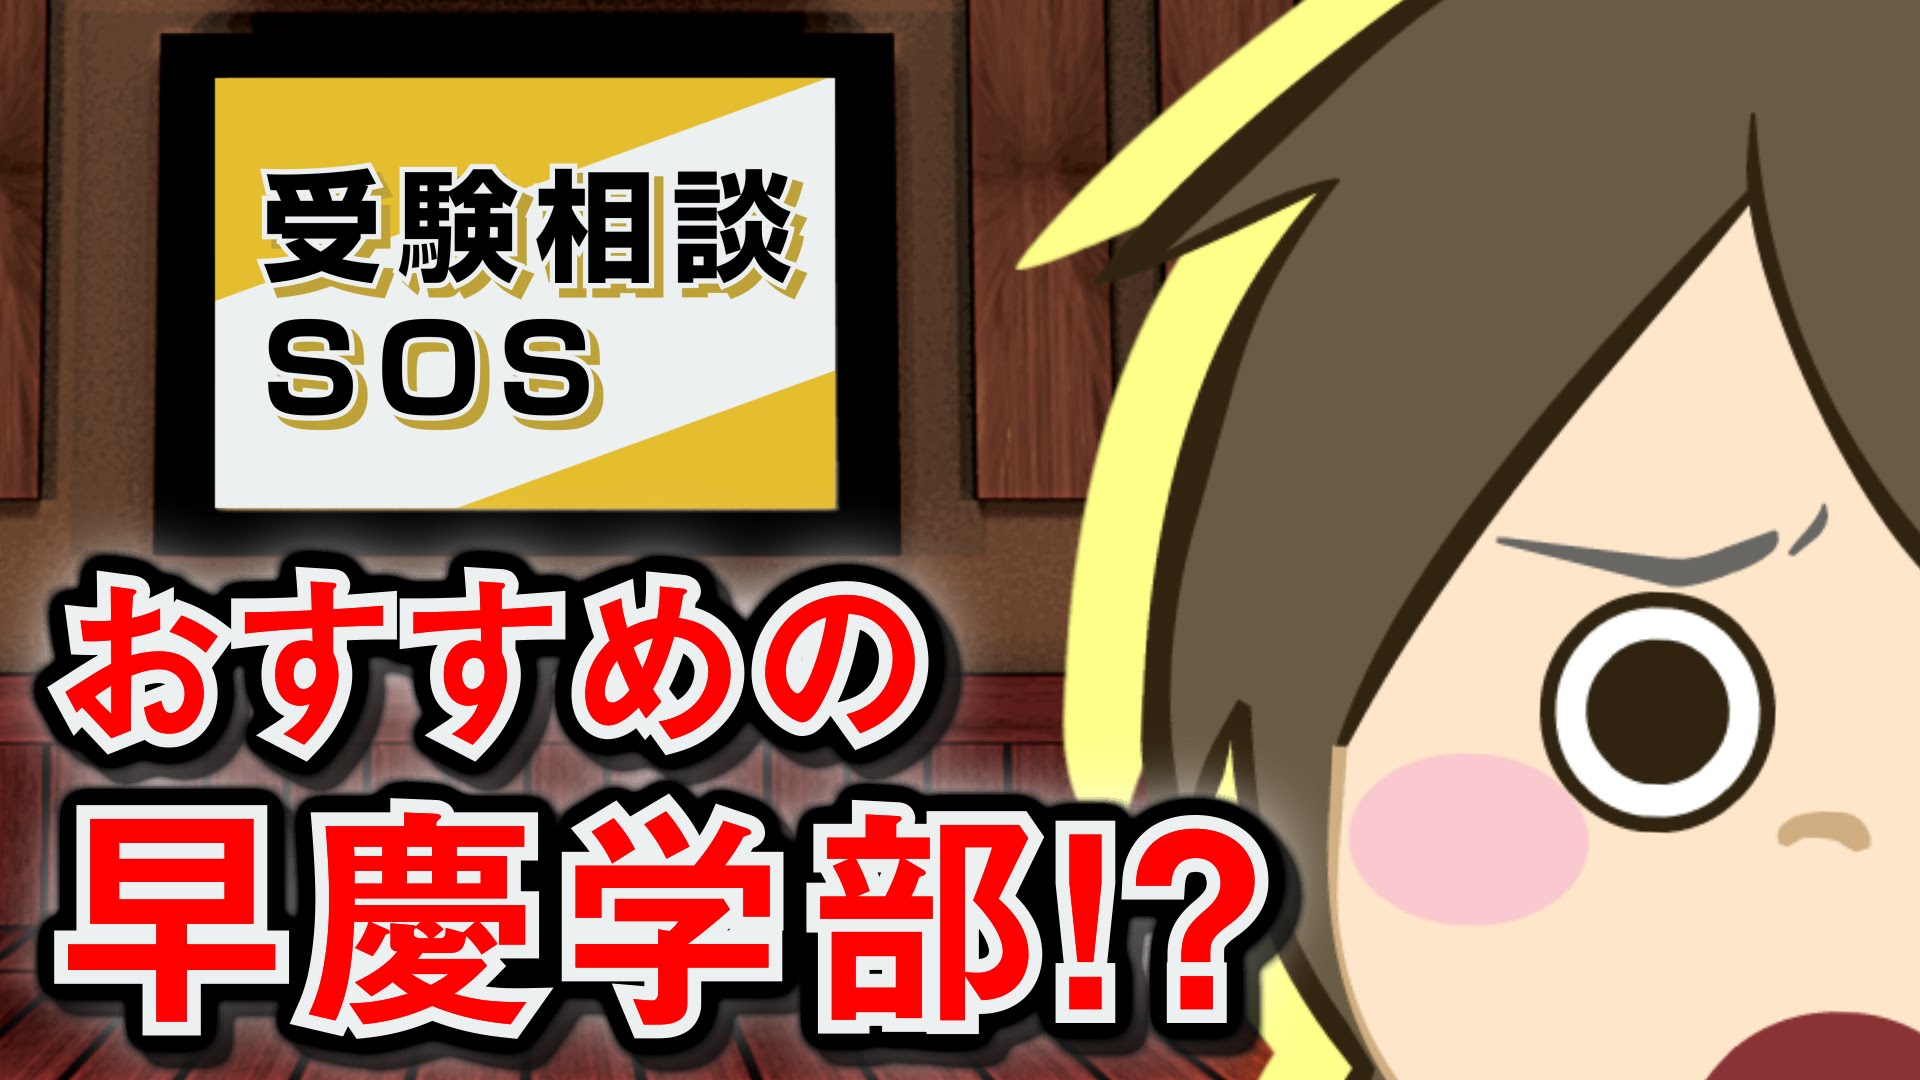 【vol.35】早慶(早稲田・慶應)でおすすめの学部は!?|受験相談SOS